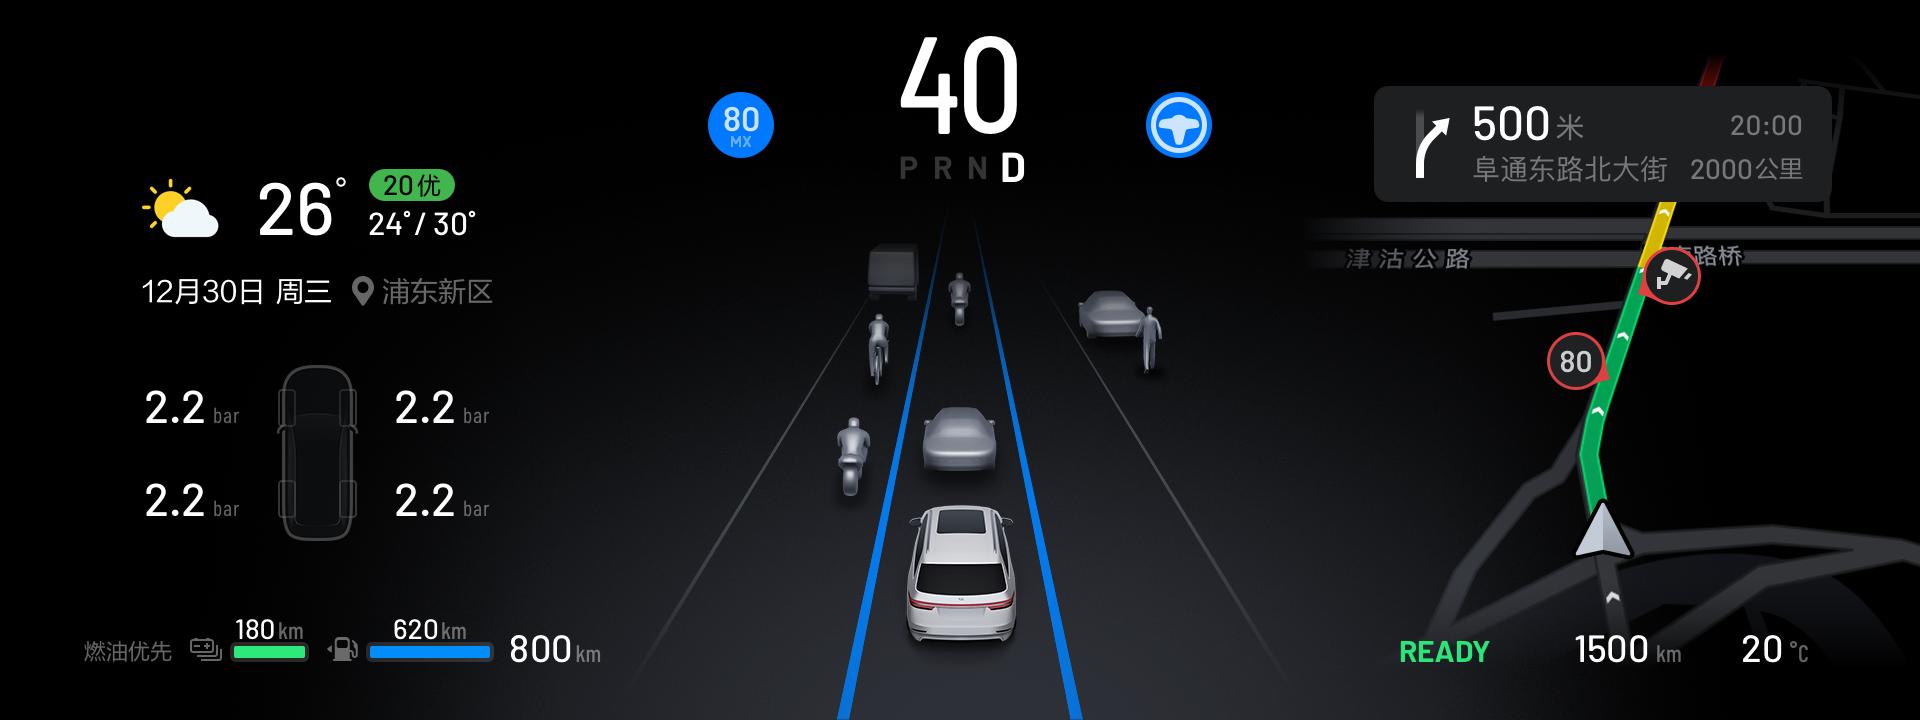 新设计的仪表屏界面.png